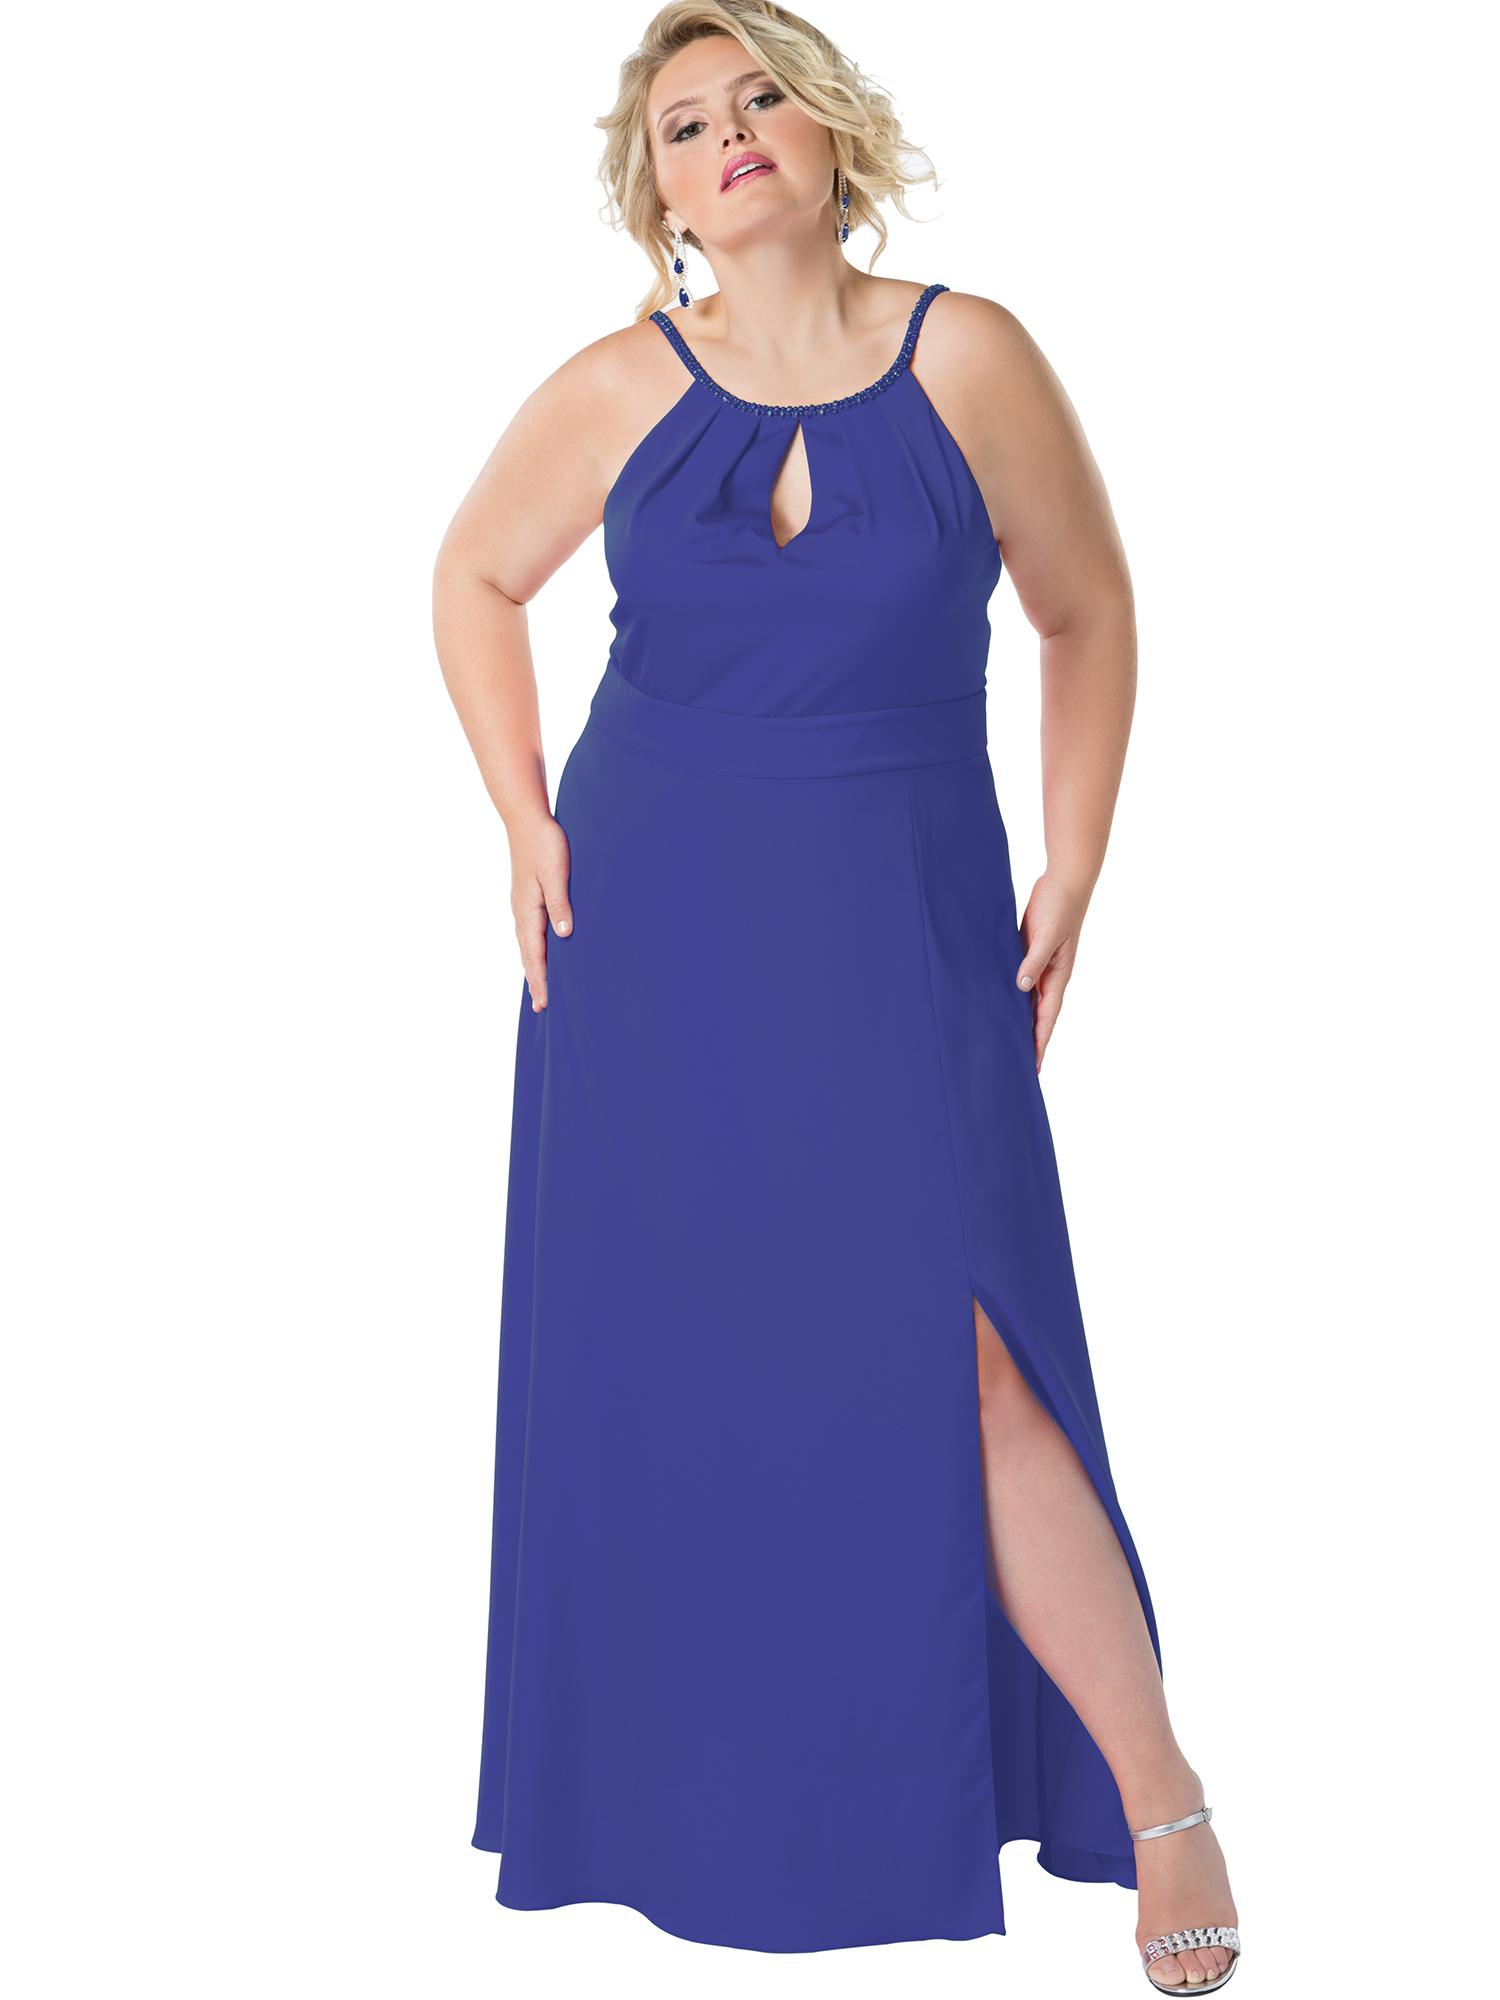 Plus Size Formal Dress Stores Sydney - raveitsafe